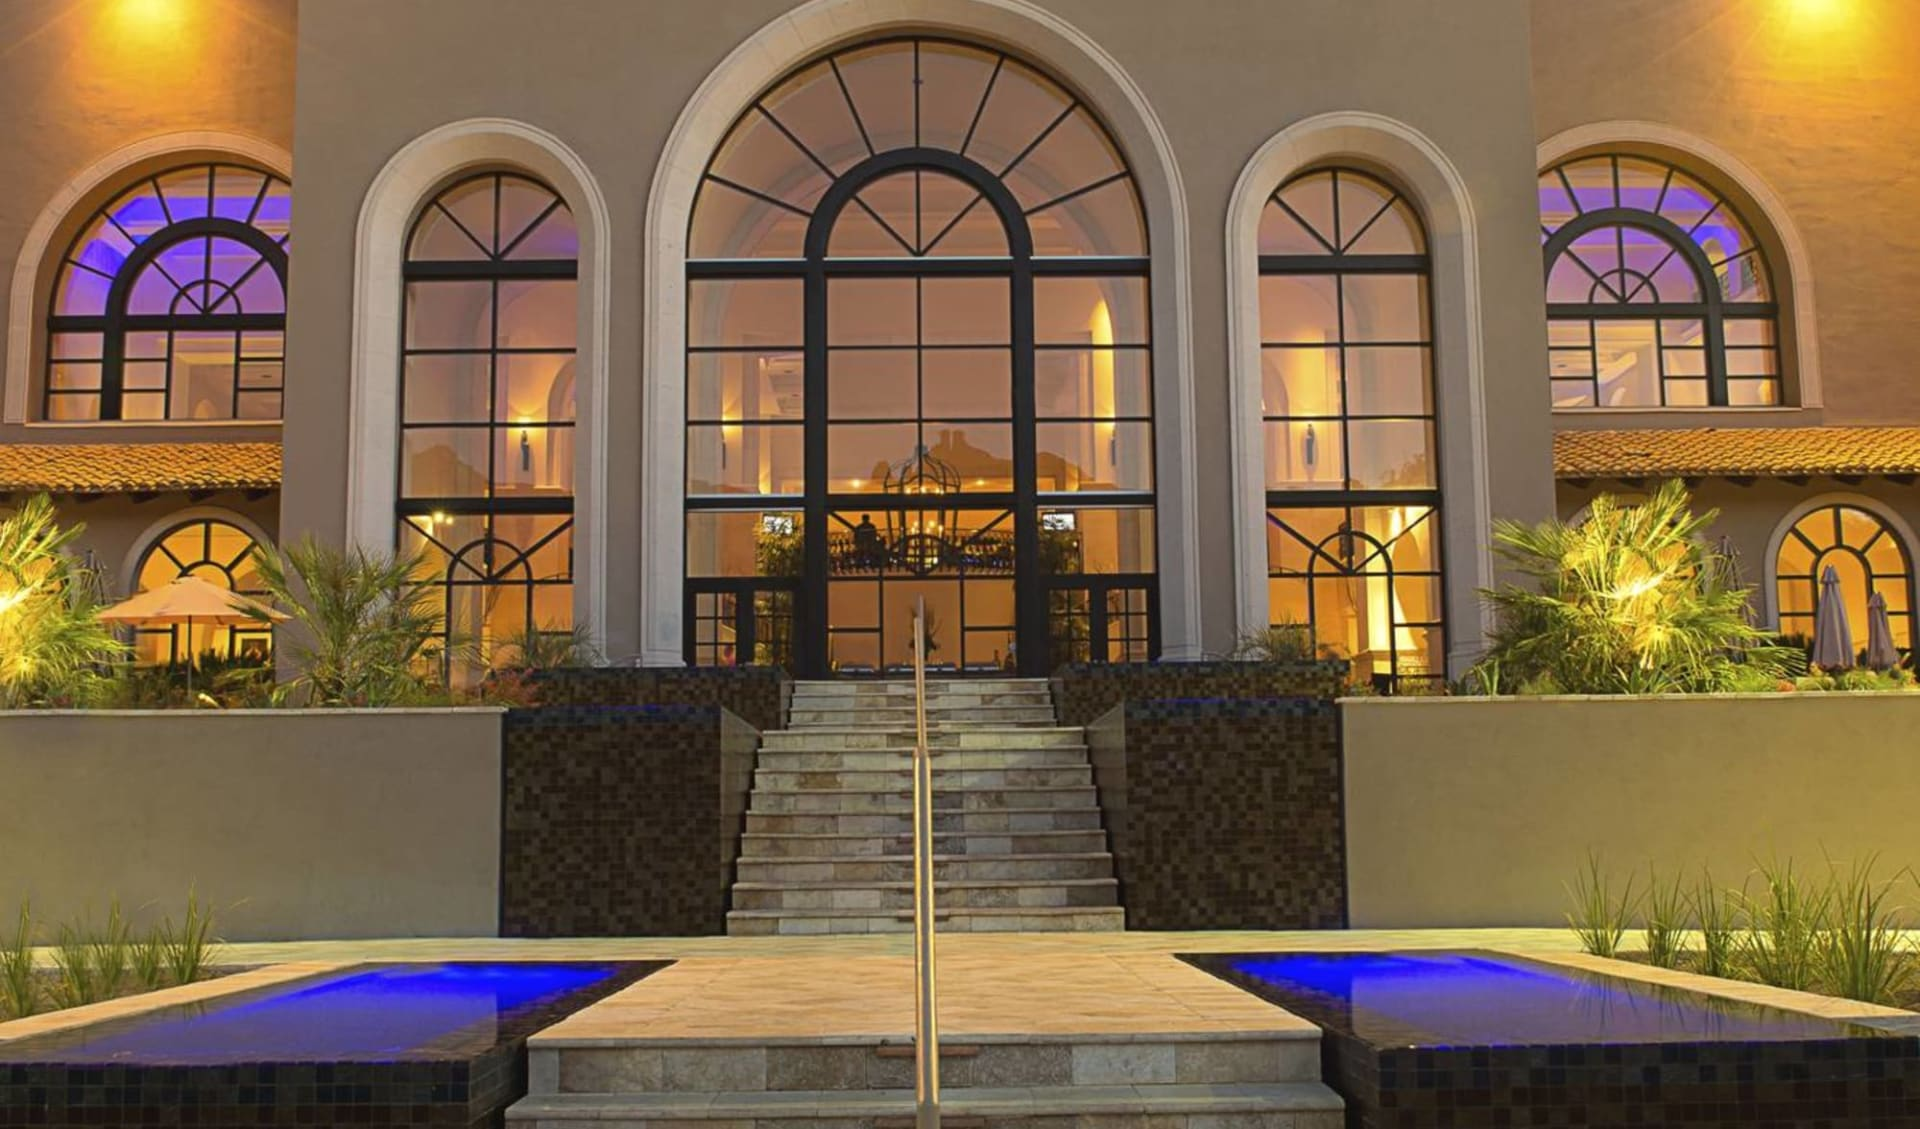 The Westin La Paloma Resort & Spa in Tucson:  The Westin La Paloma Resort & Spa - Azul Patio